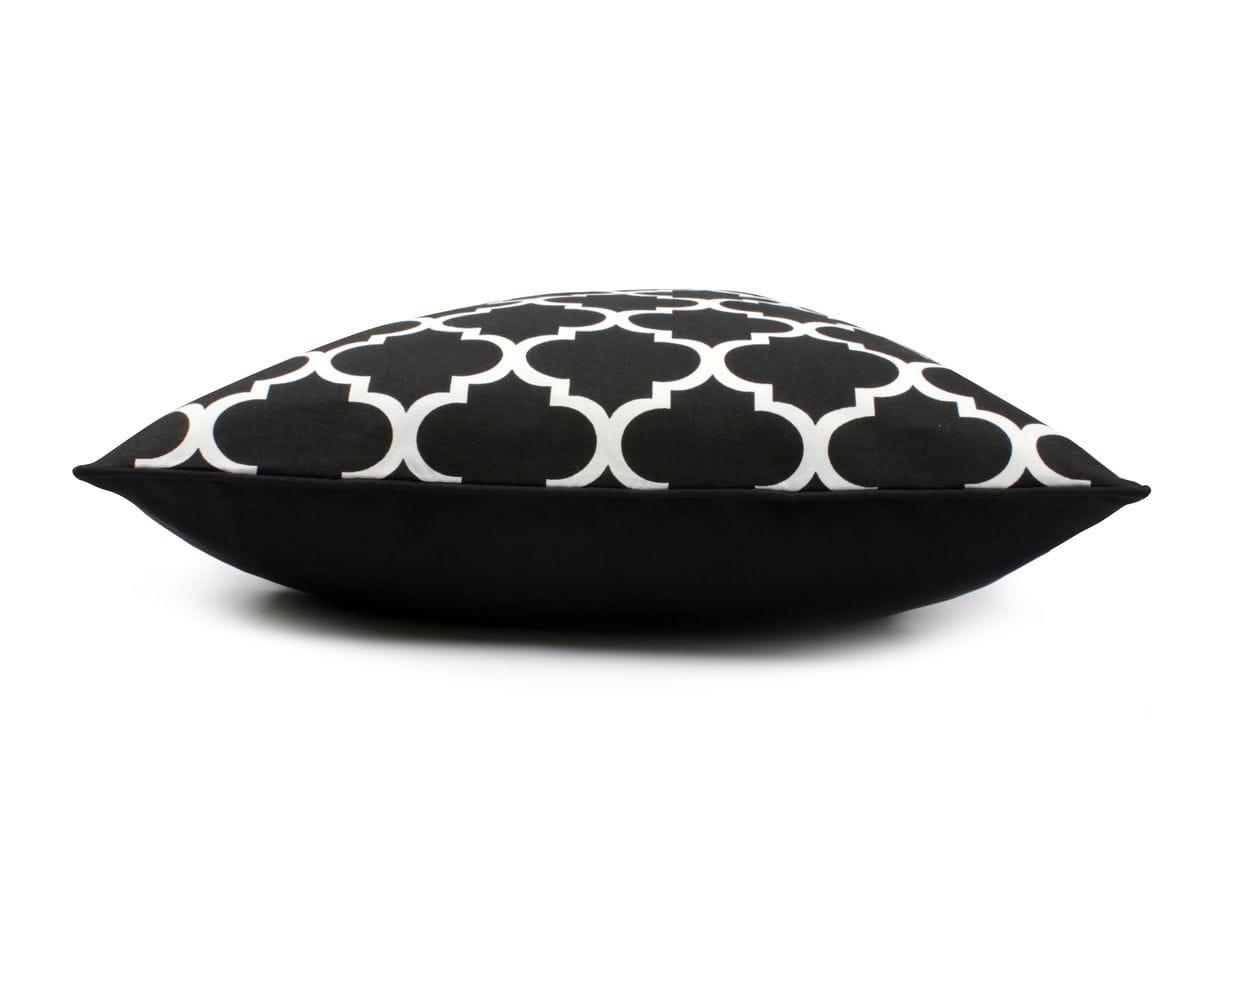 Poduszka dekoracyjna Clover Black 60x60 cm - We Love Candles&We Love Beds